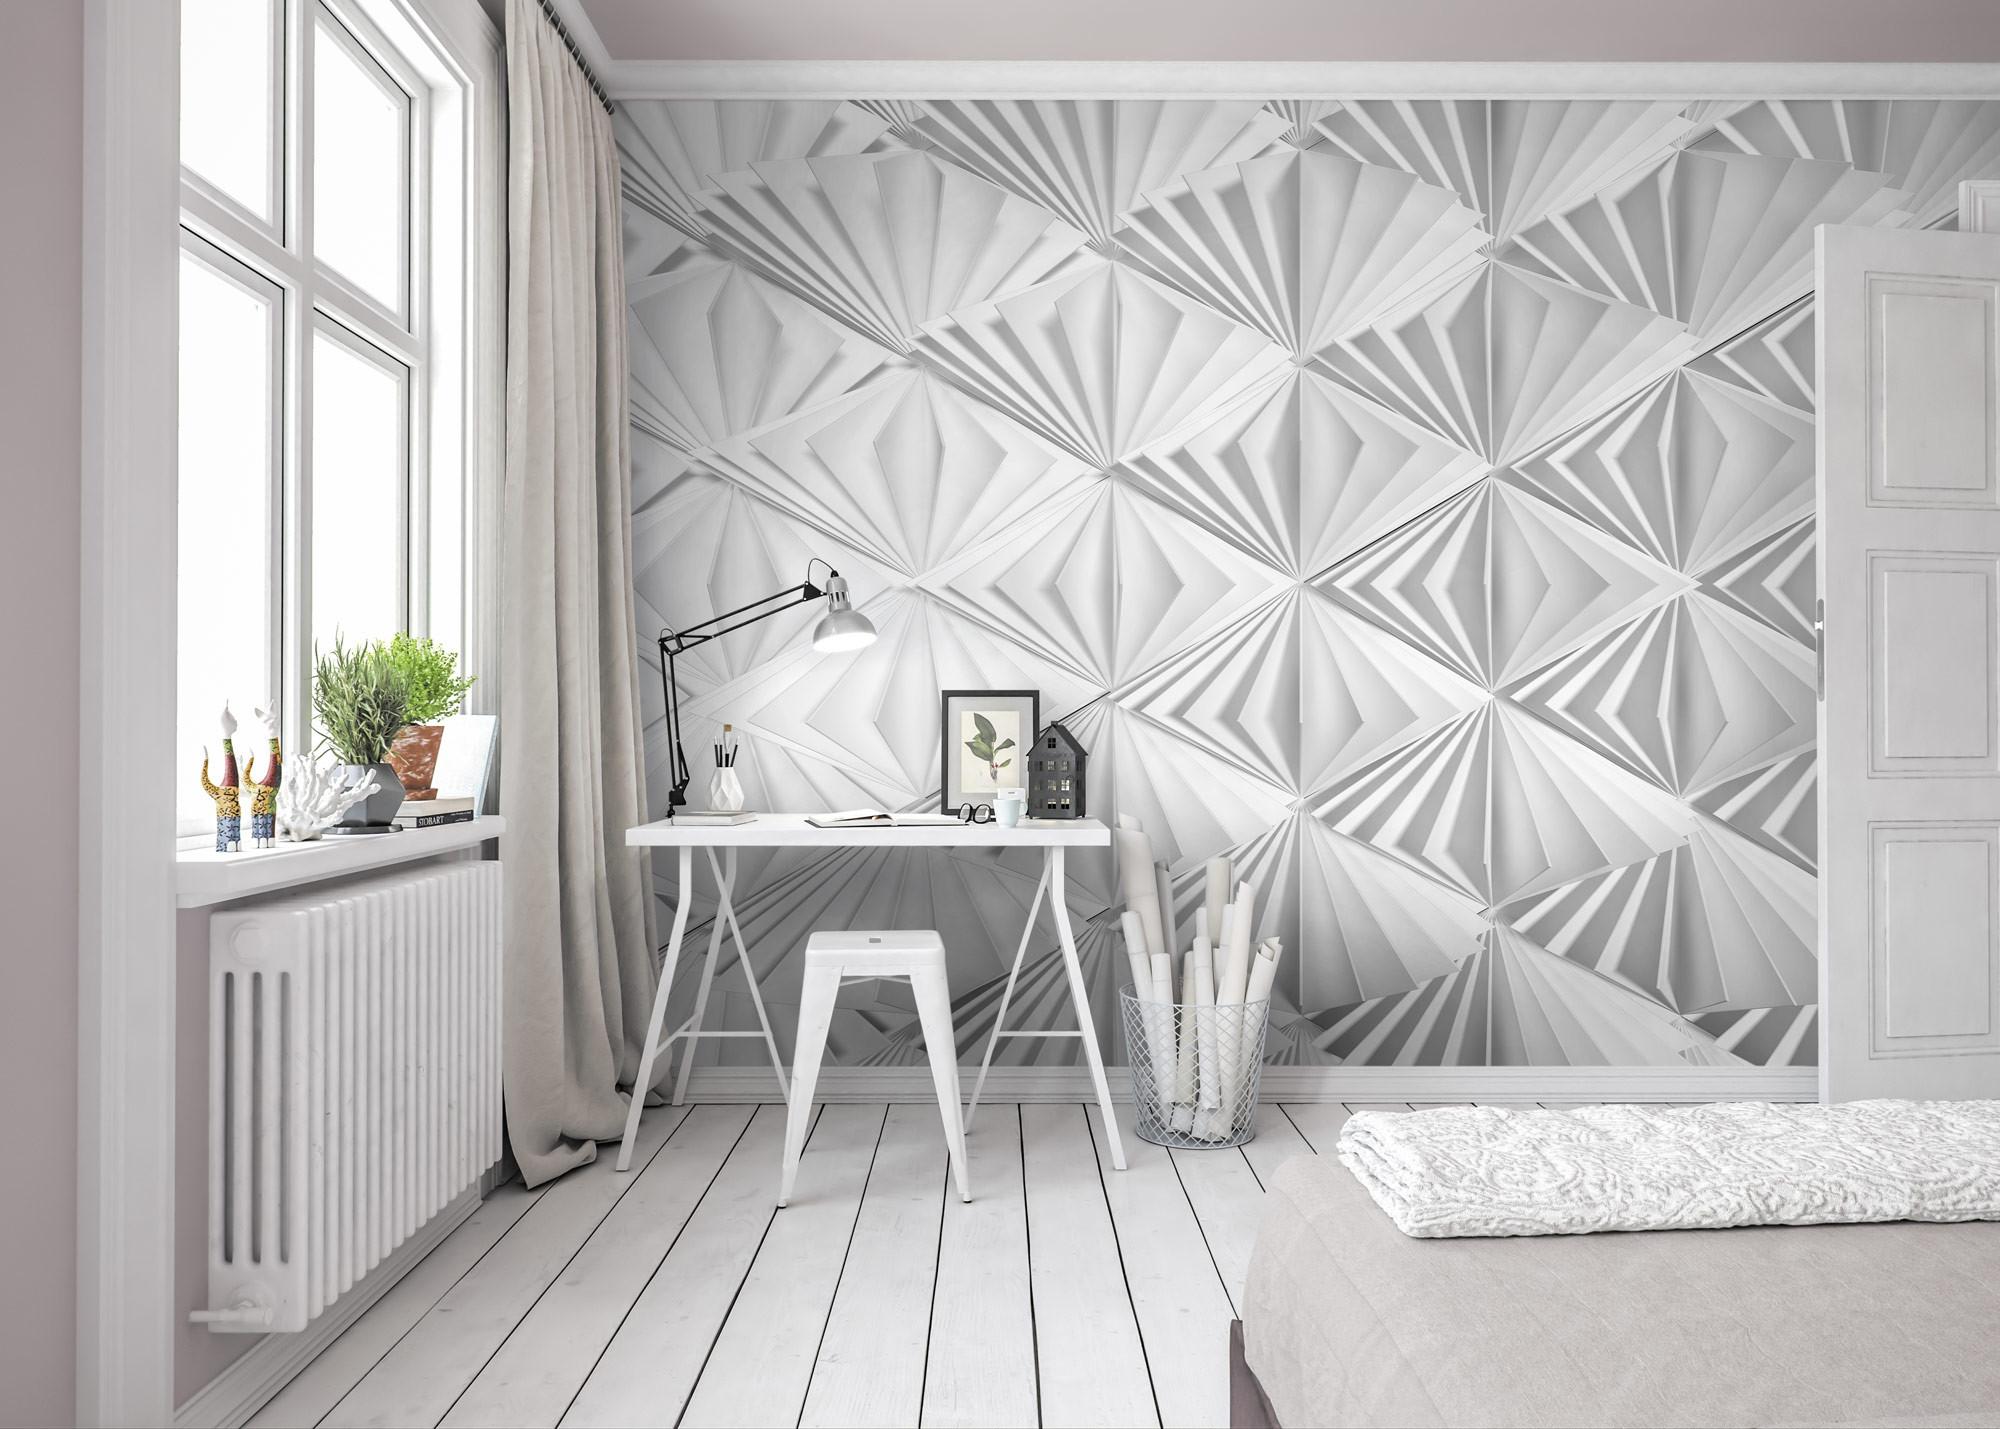 Fototapete Grau Wei : Geräumiges moderne dekoration fototapete grau weis einzigartige